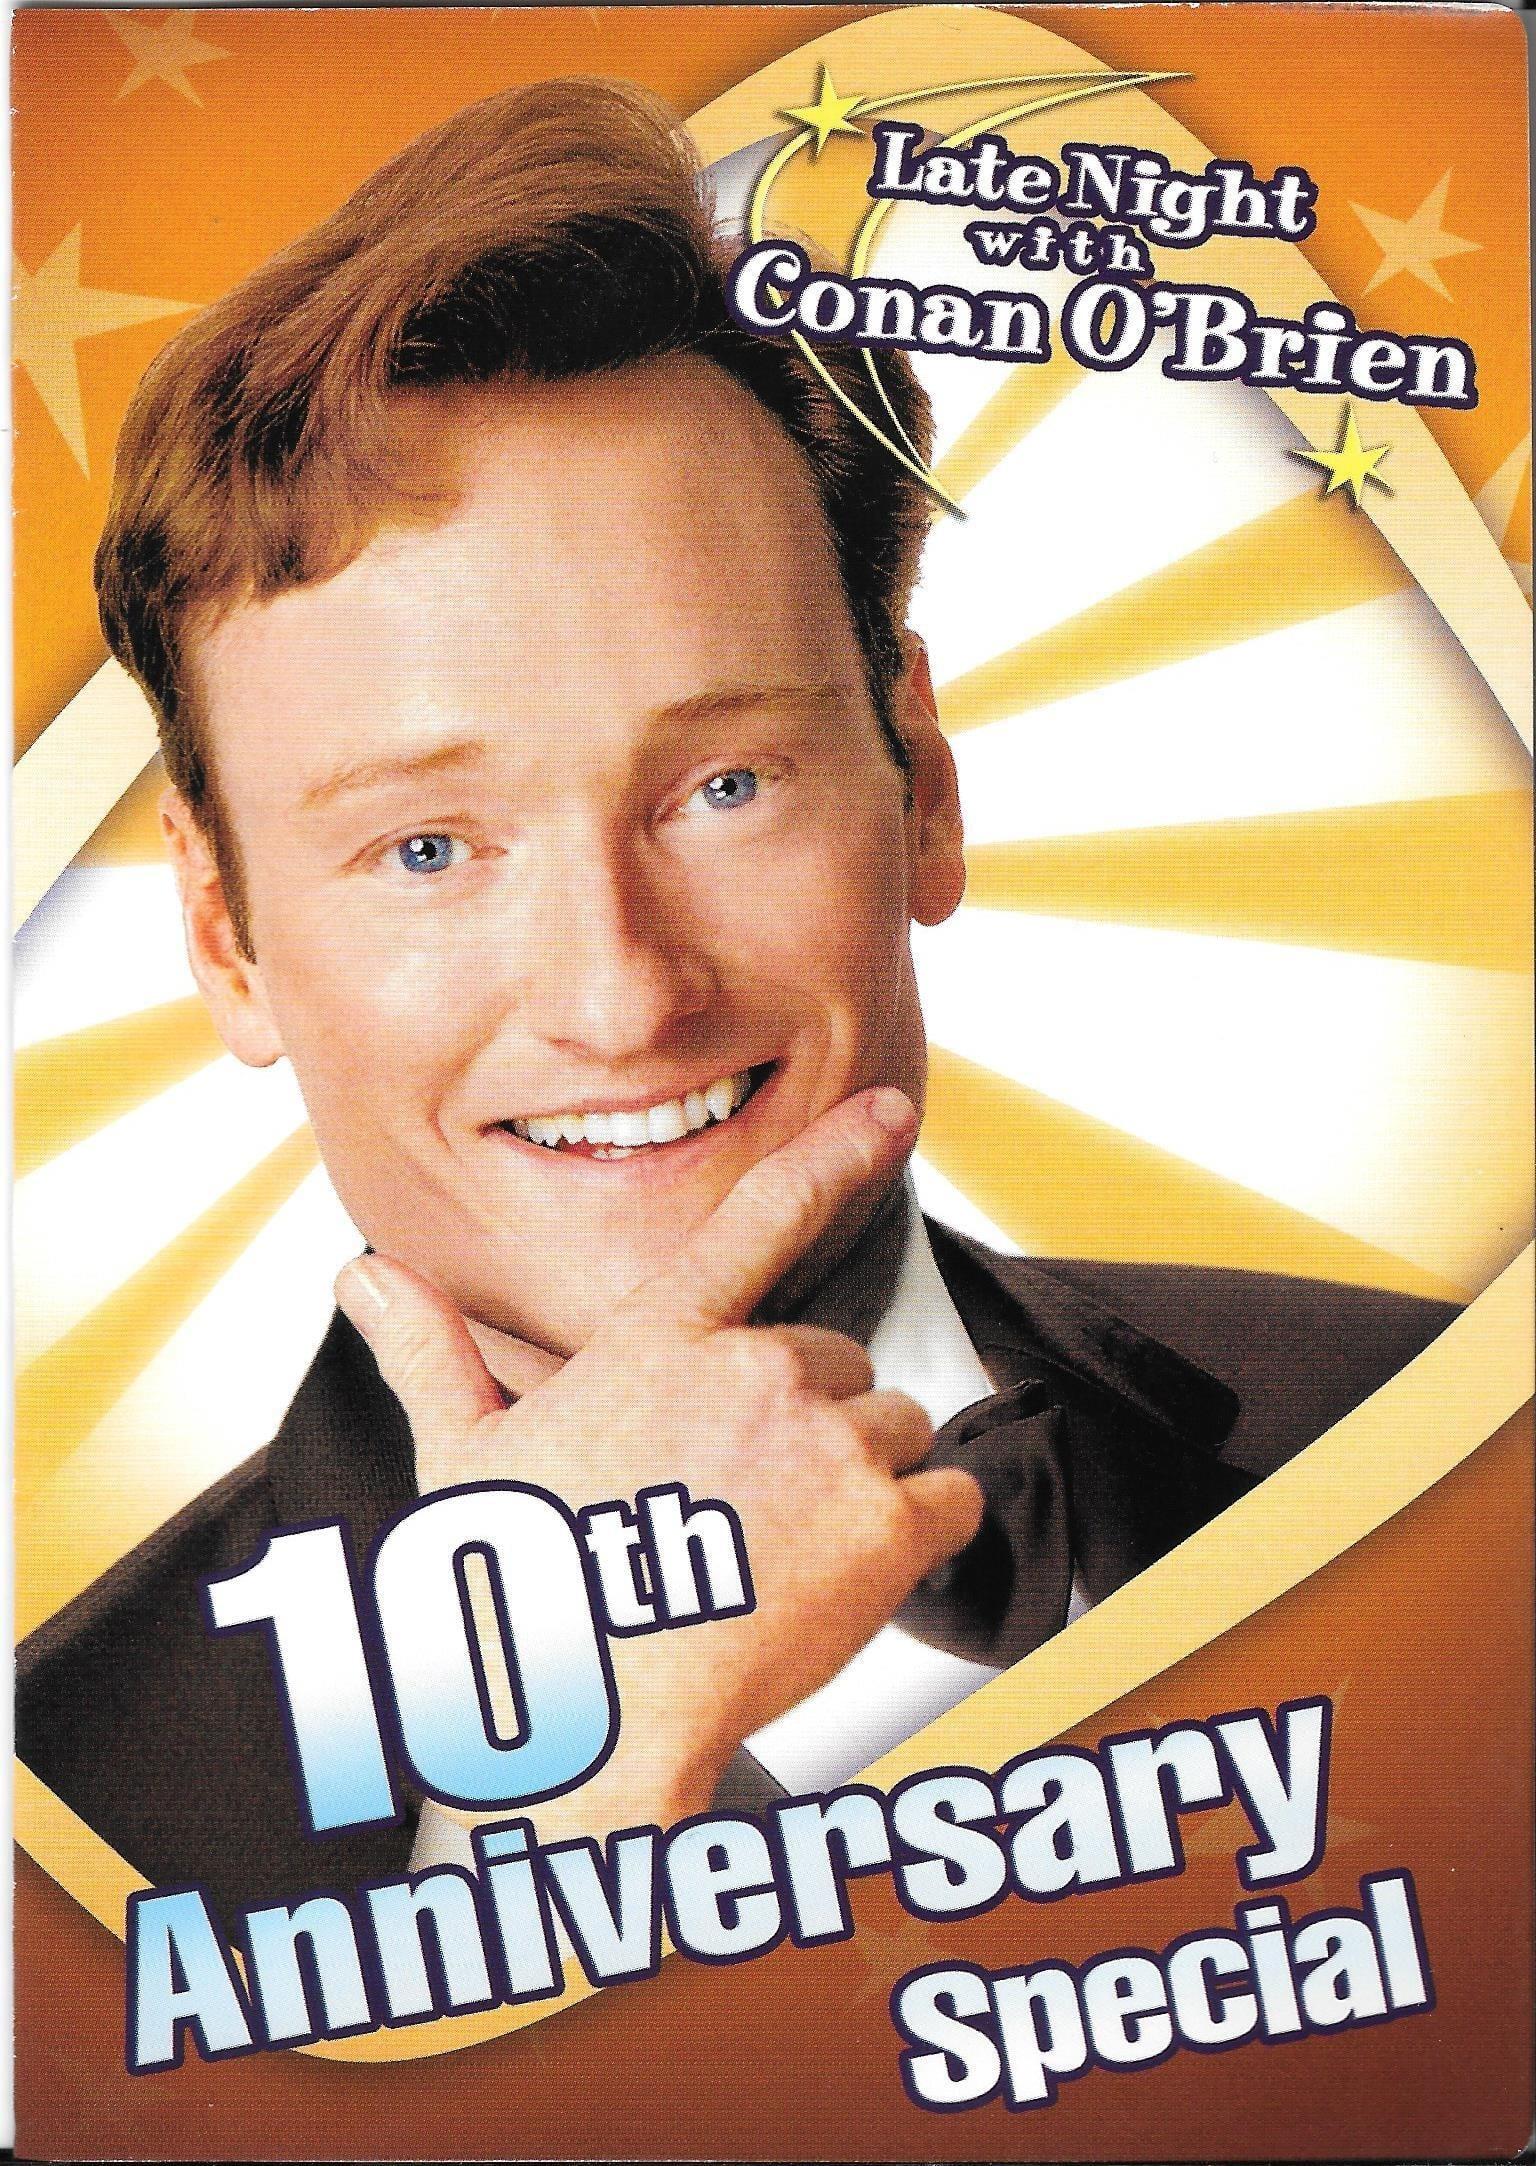 Late Night with Conan O'Brien: 10th Anniversary Special (2003)